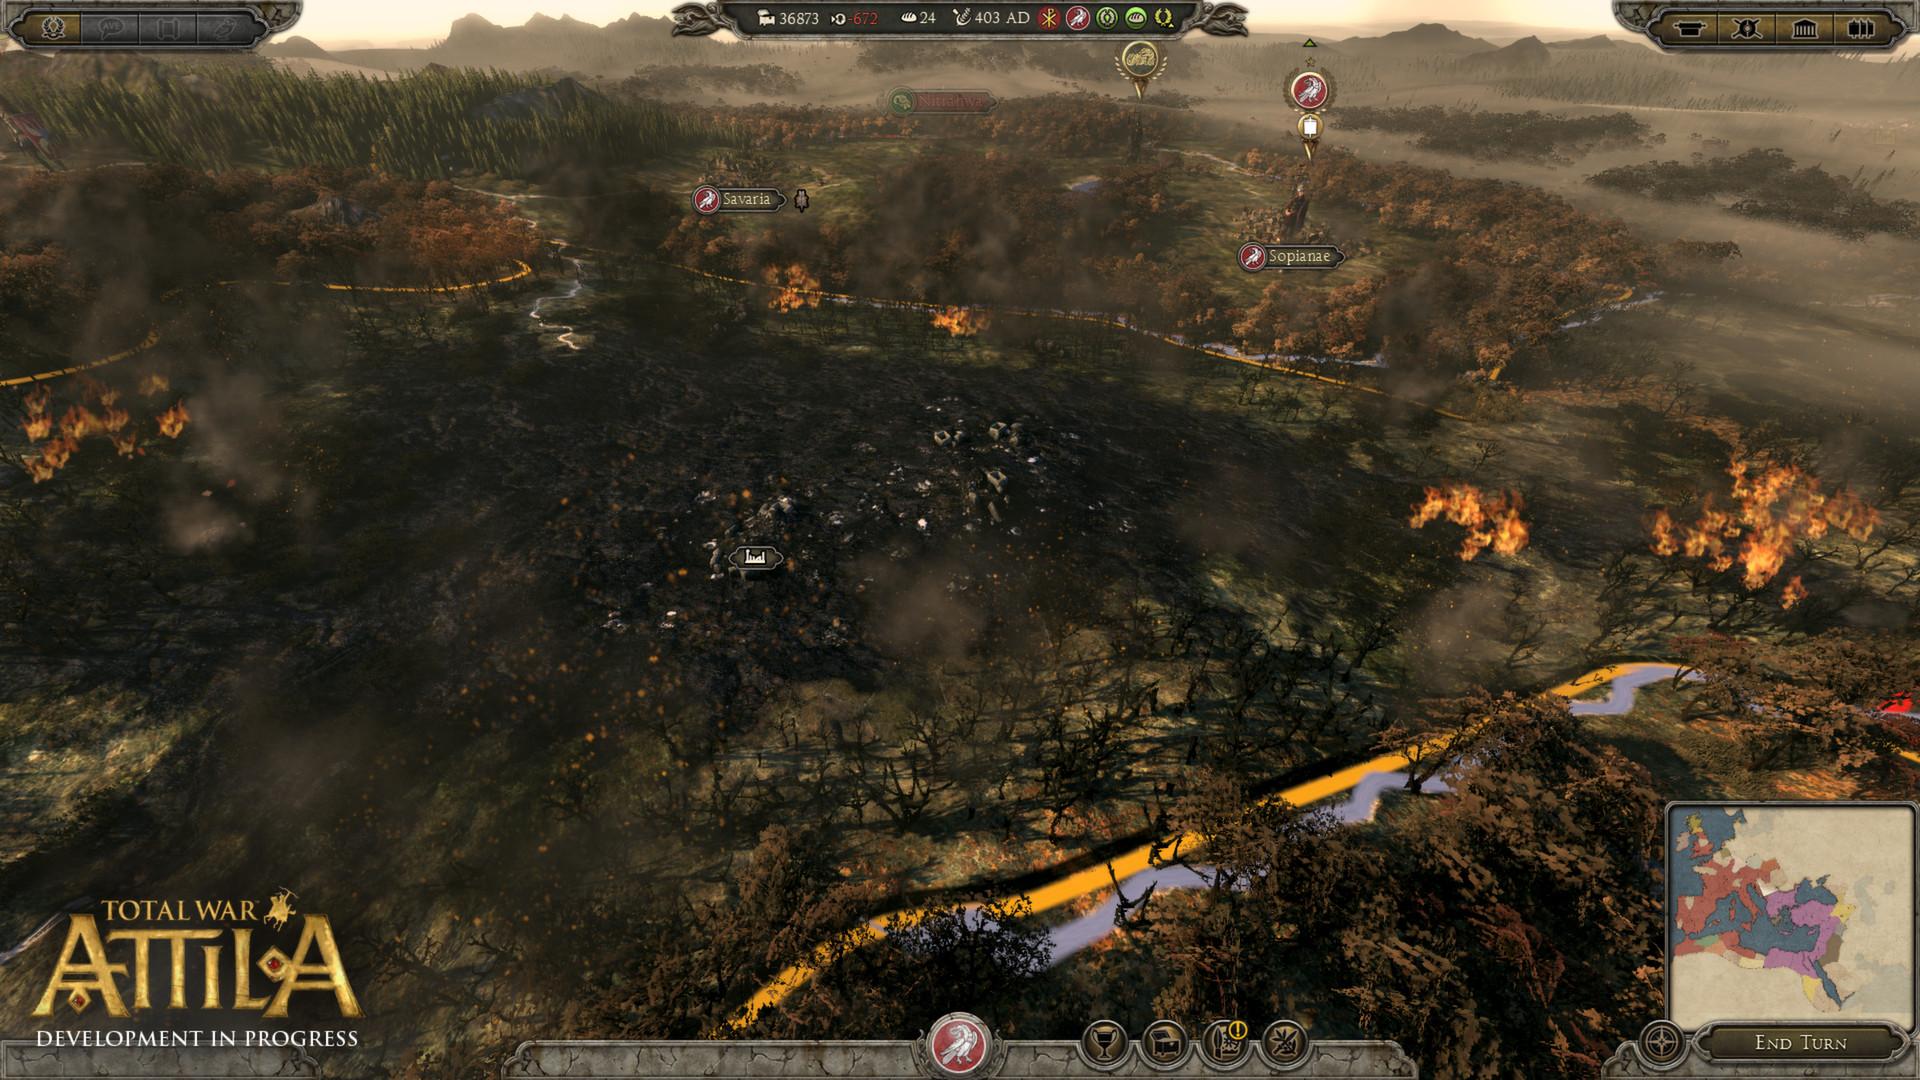 Total War Attila ESPAÑOL Full PC Incluye DLC (CPY) + REPACK 2 DVD5 (JPW) 8